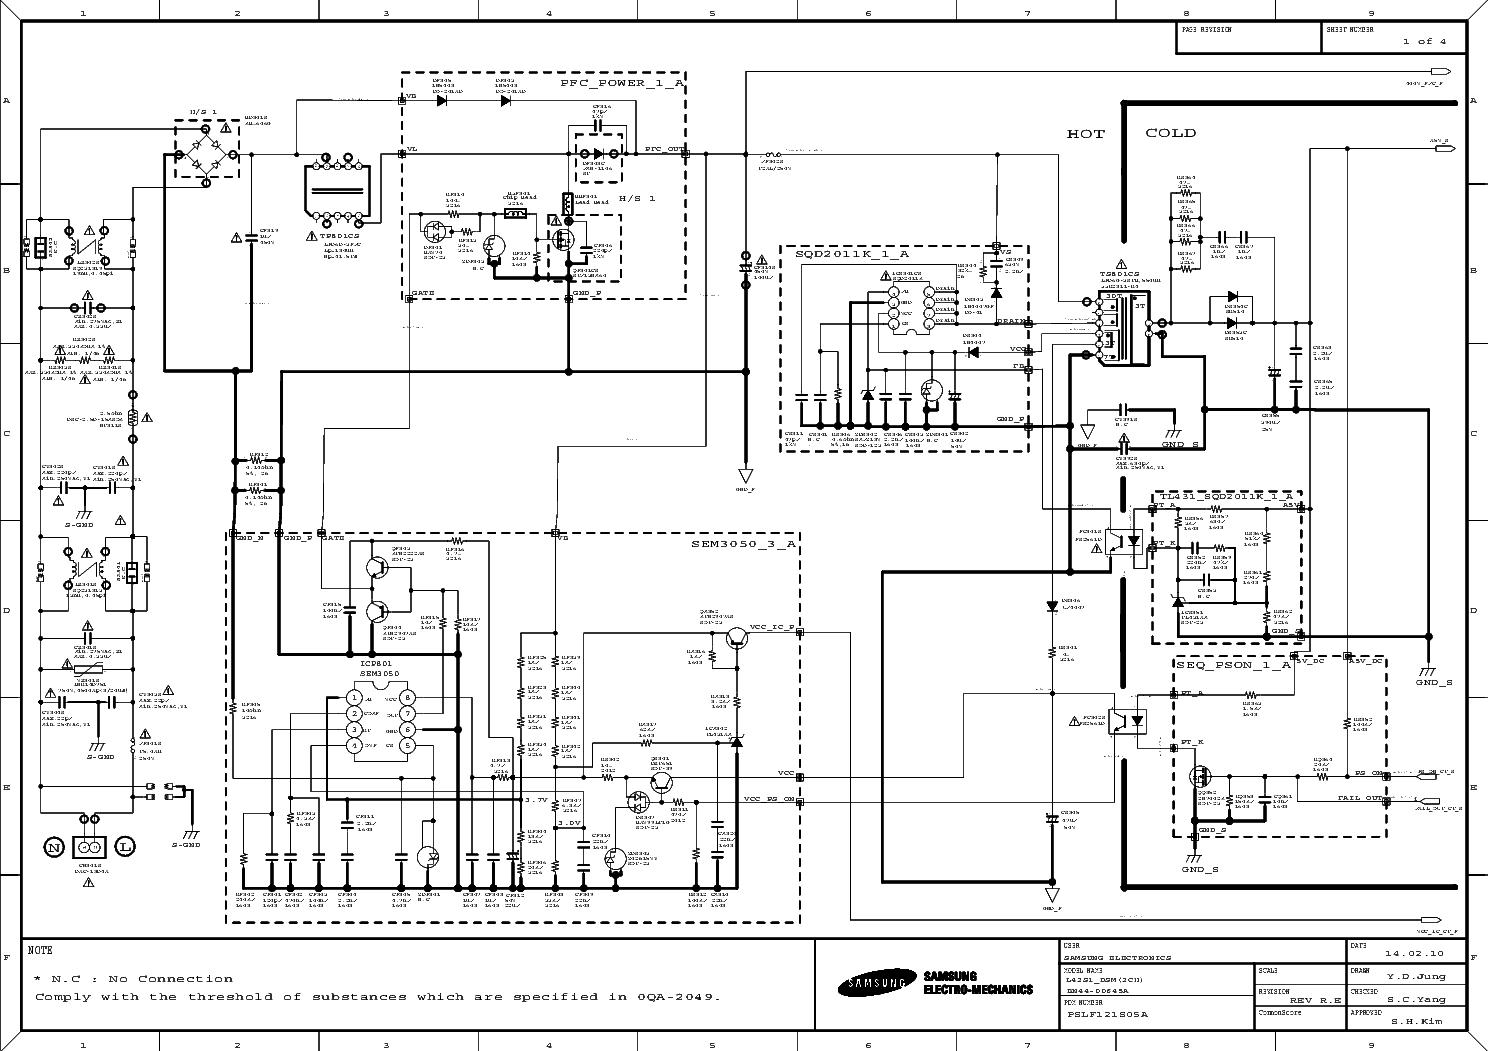 Samsung Bn44 A 40f Smps Sch Service Manual